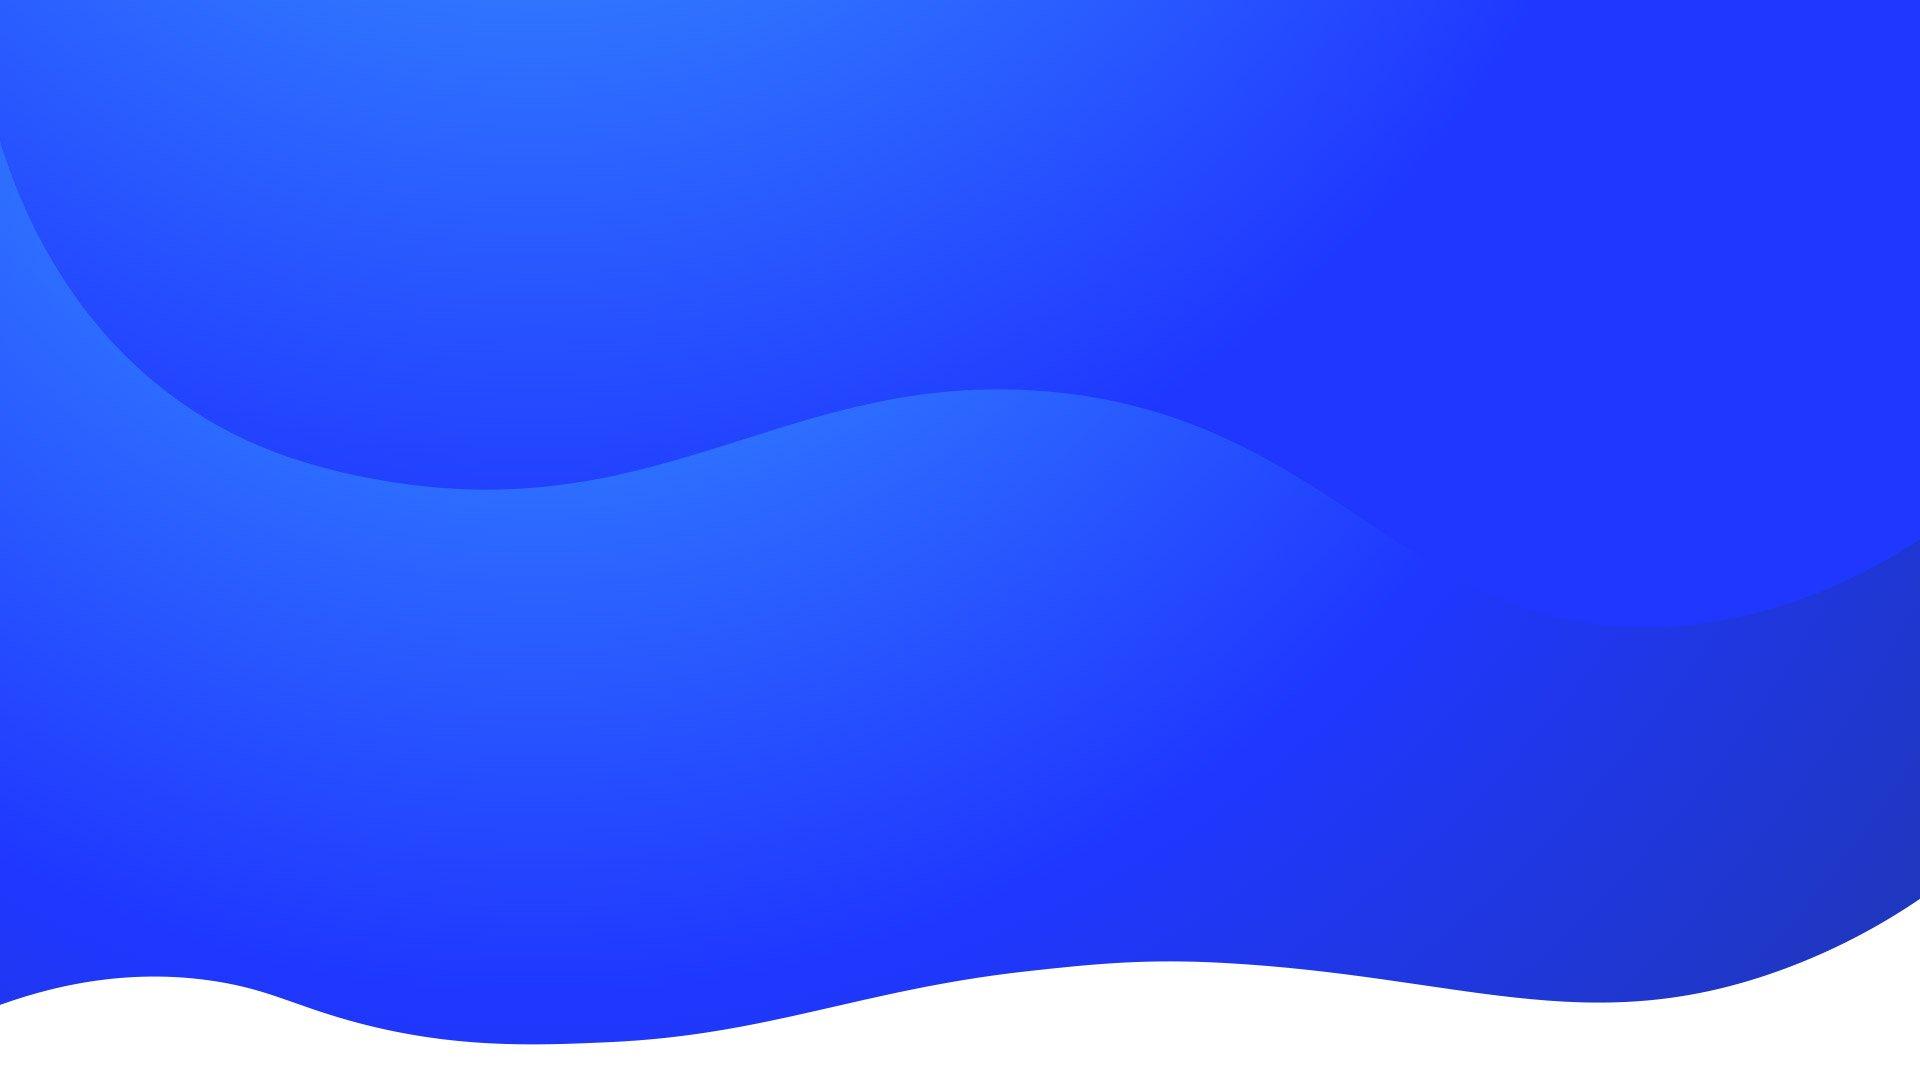 Blue Gradient Waves